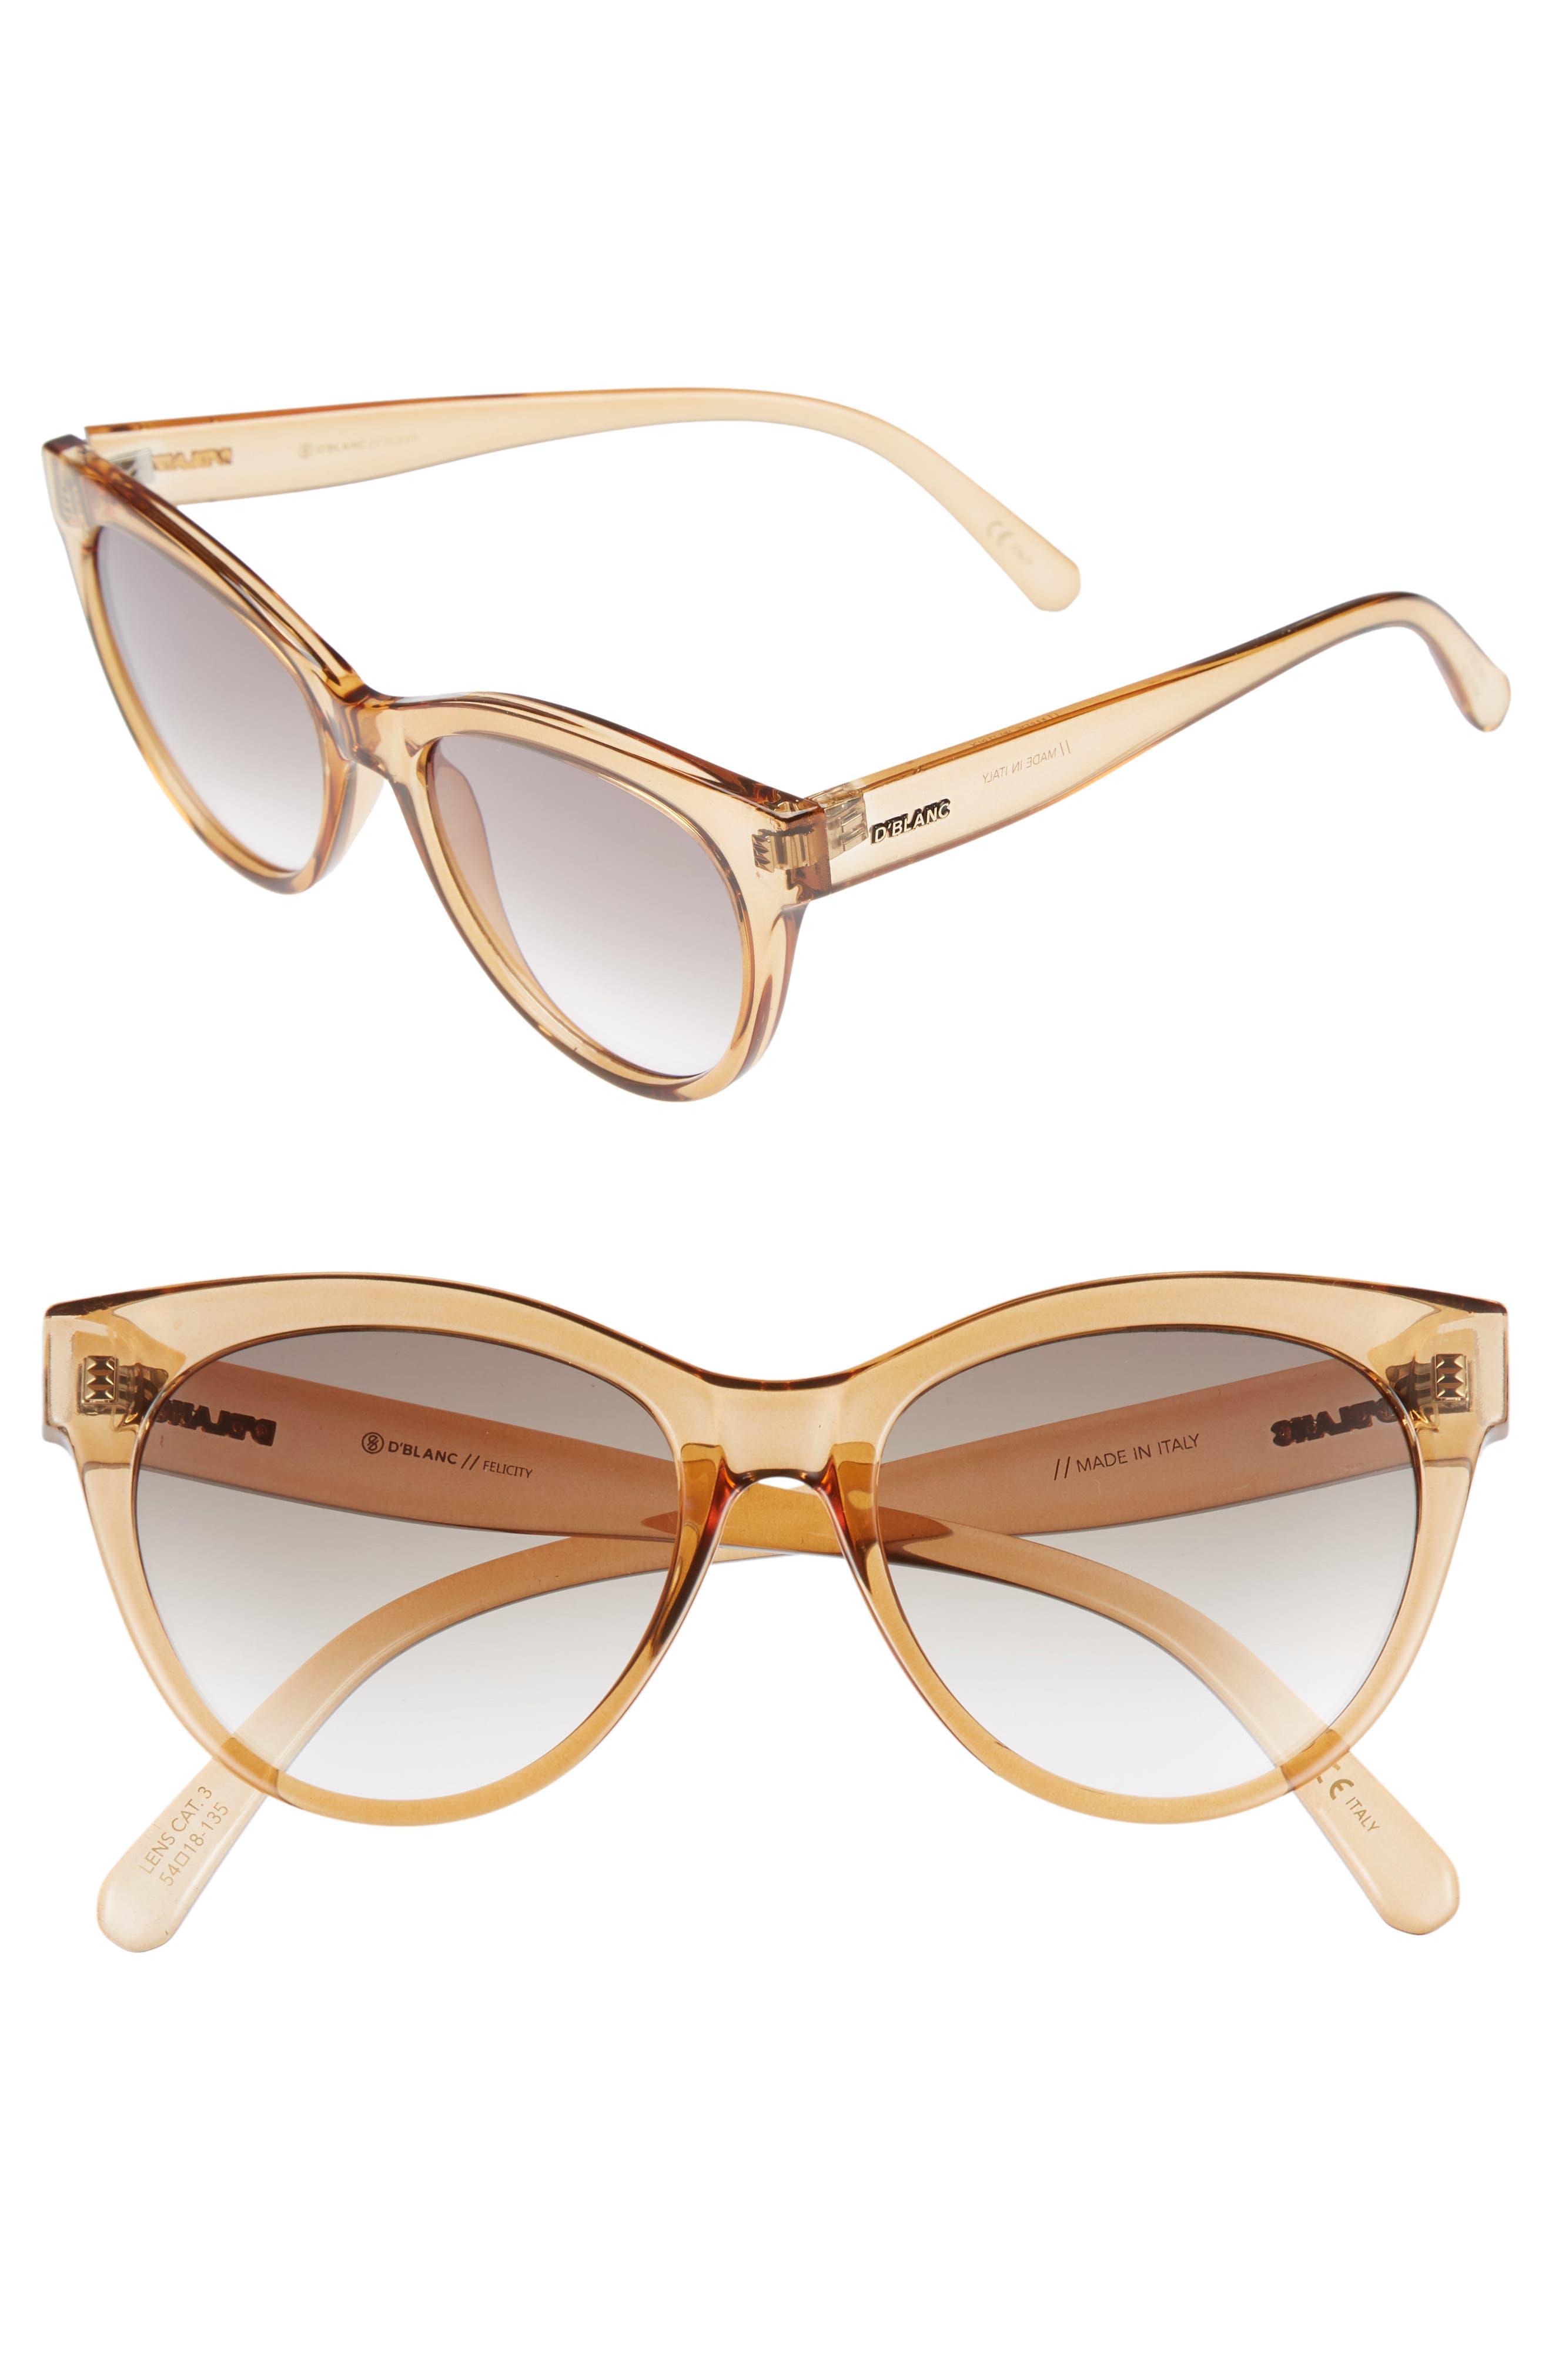 D'BLANC Felicity 54mm Cat Eye Sunglasses,                         Main,                         color, Chai Gloss